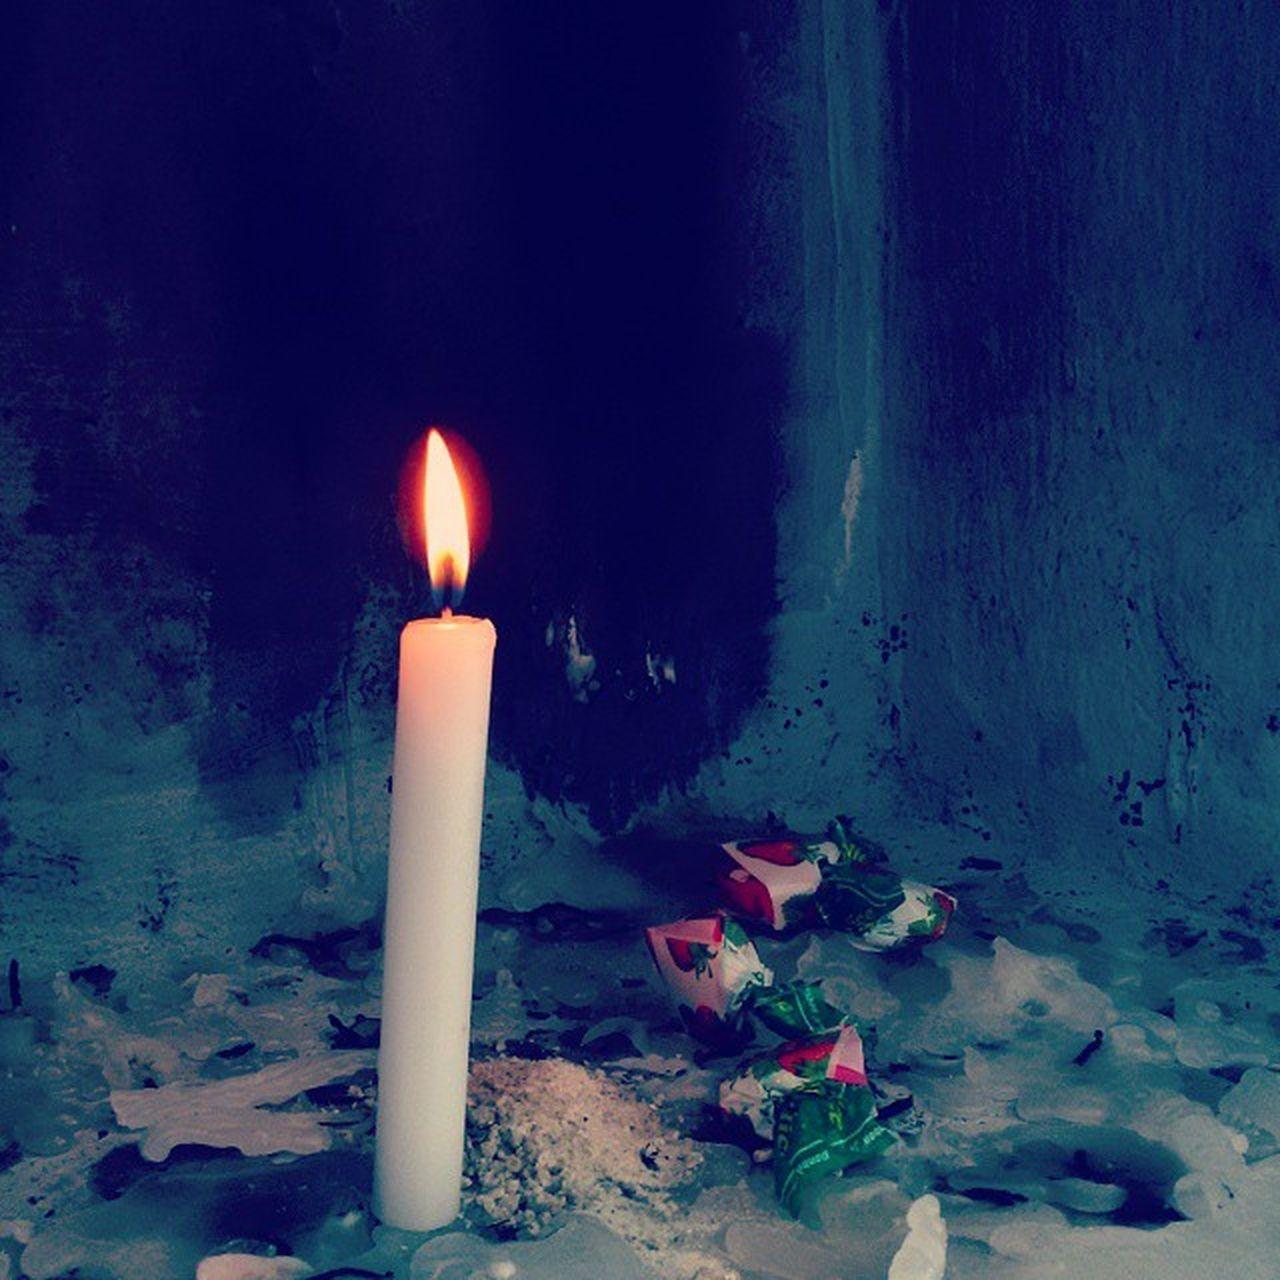 Tunisia Tradition Ziara Candle spiritual igerstunisia Carthagina أحكيلي وين النية وين لعمل ... :) لقد زرنا من أجلكم :)